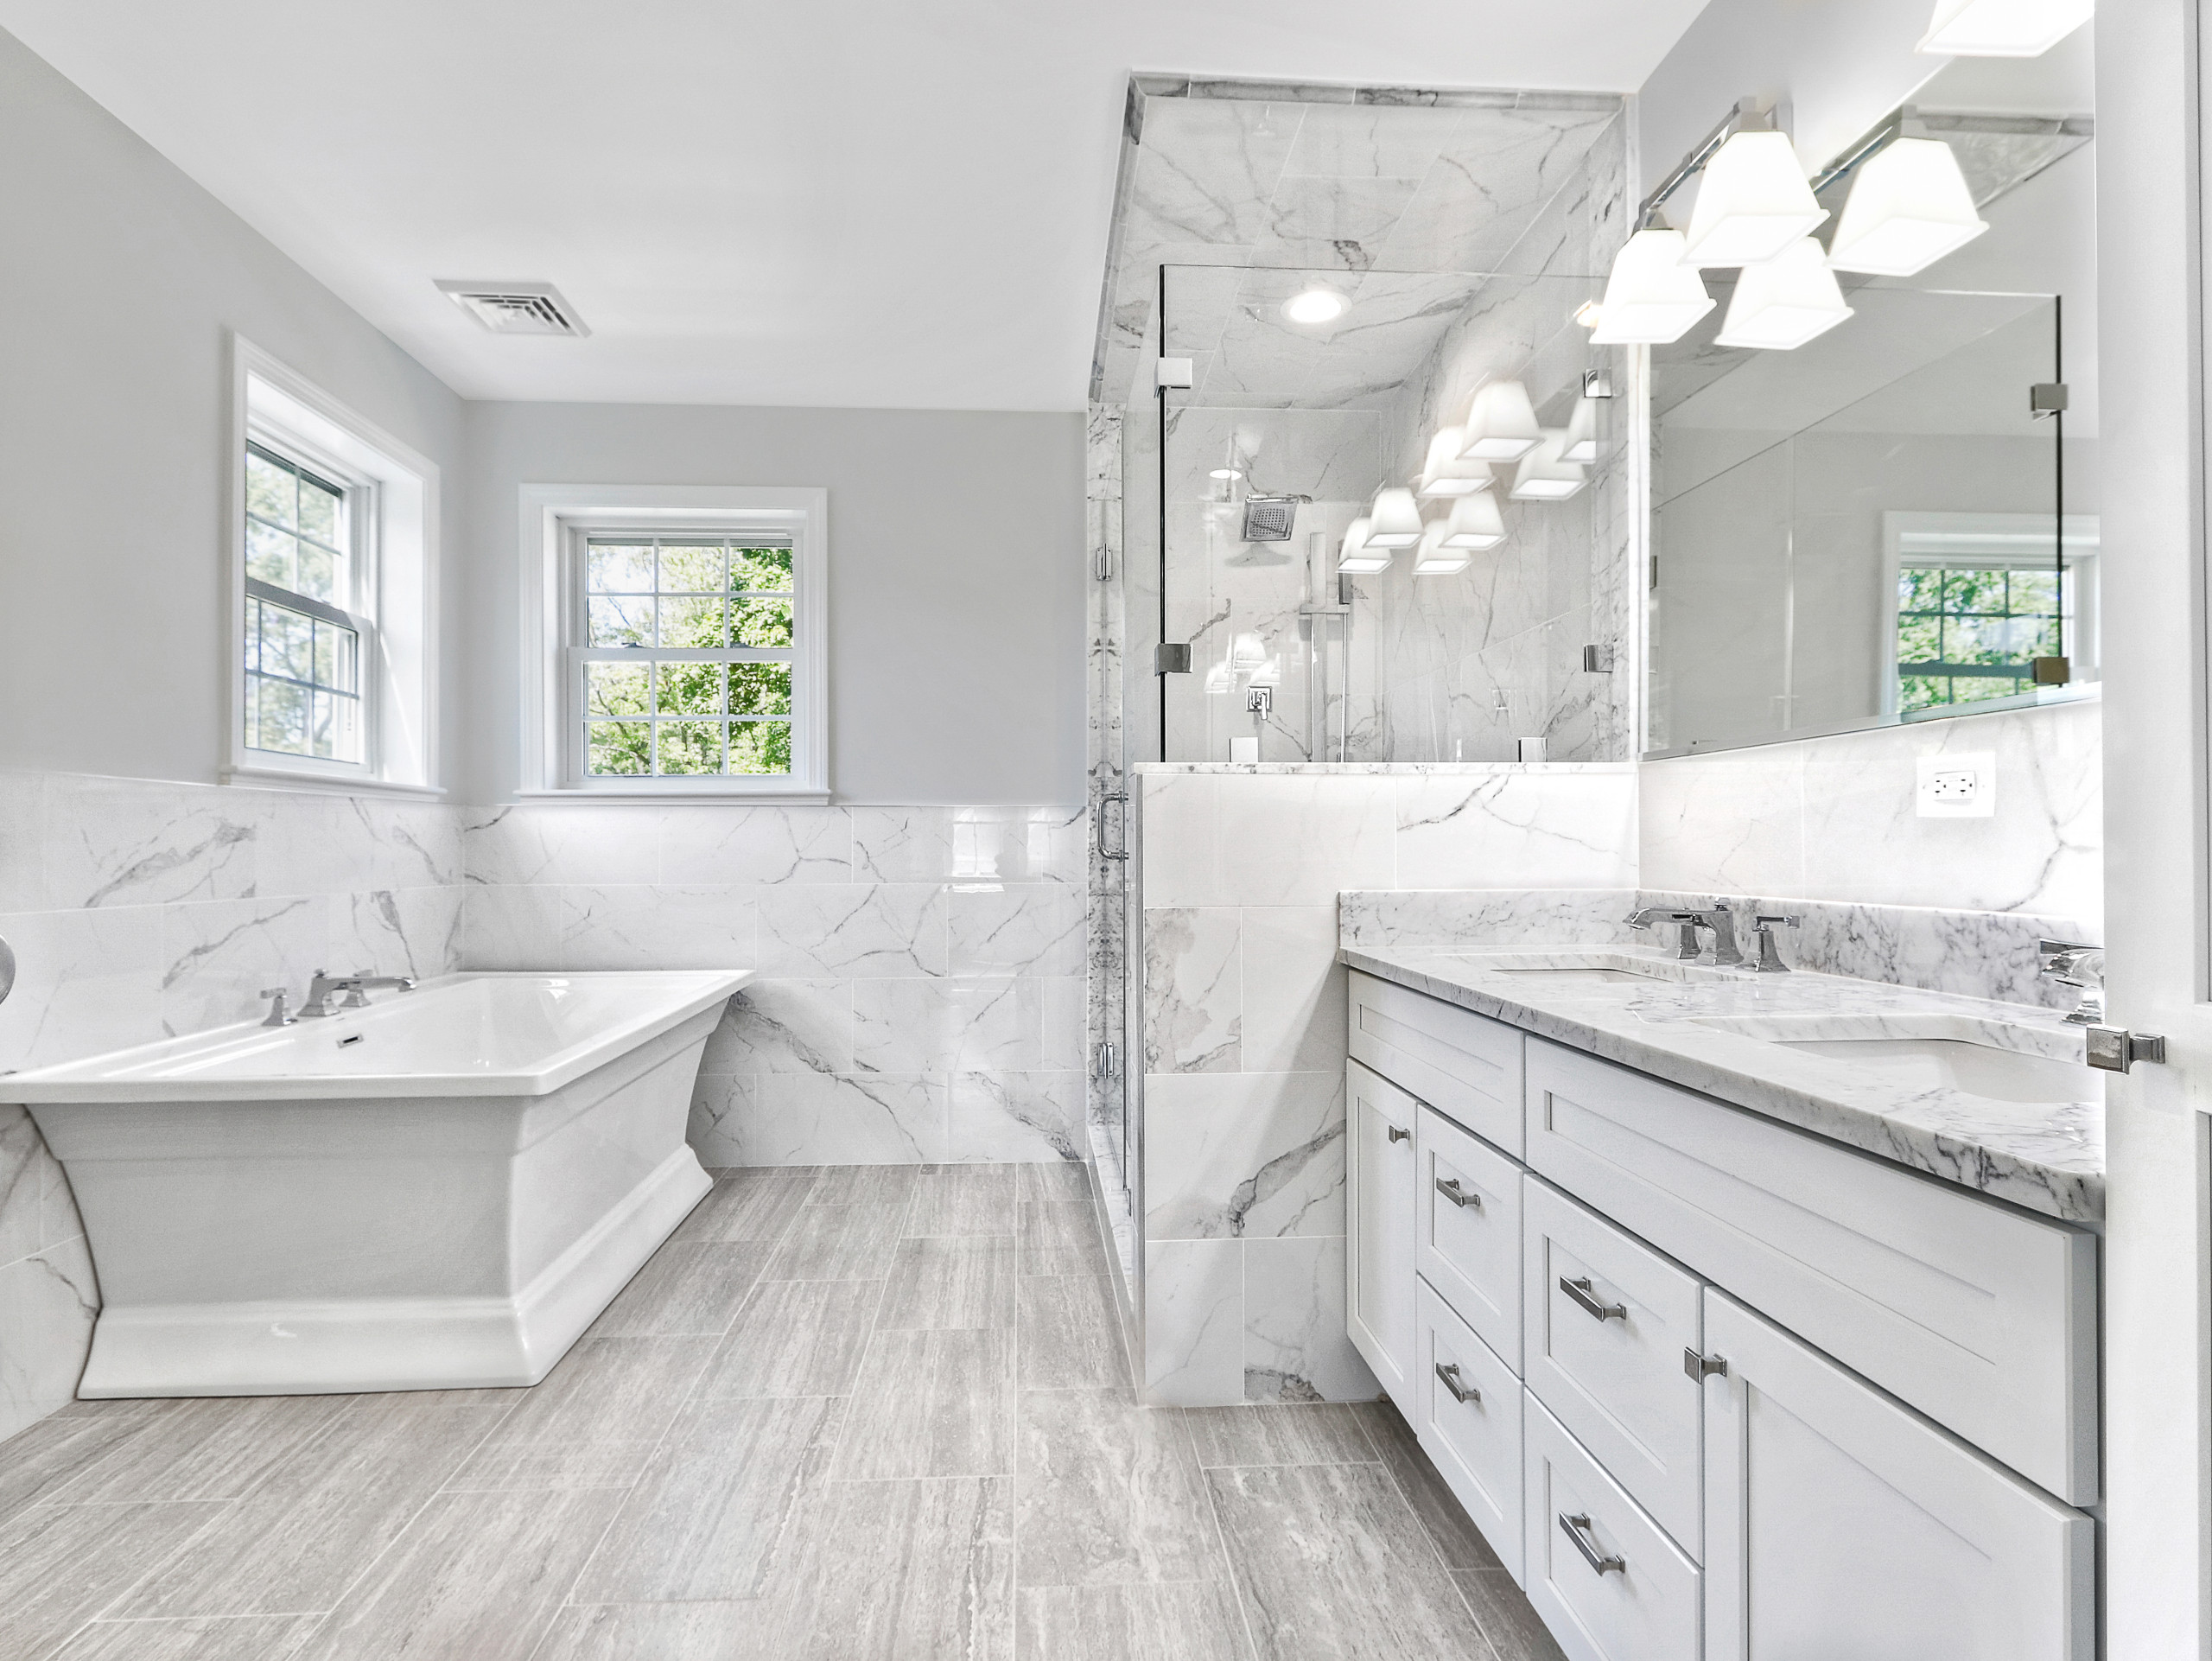 bathroom with gray countertops